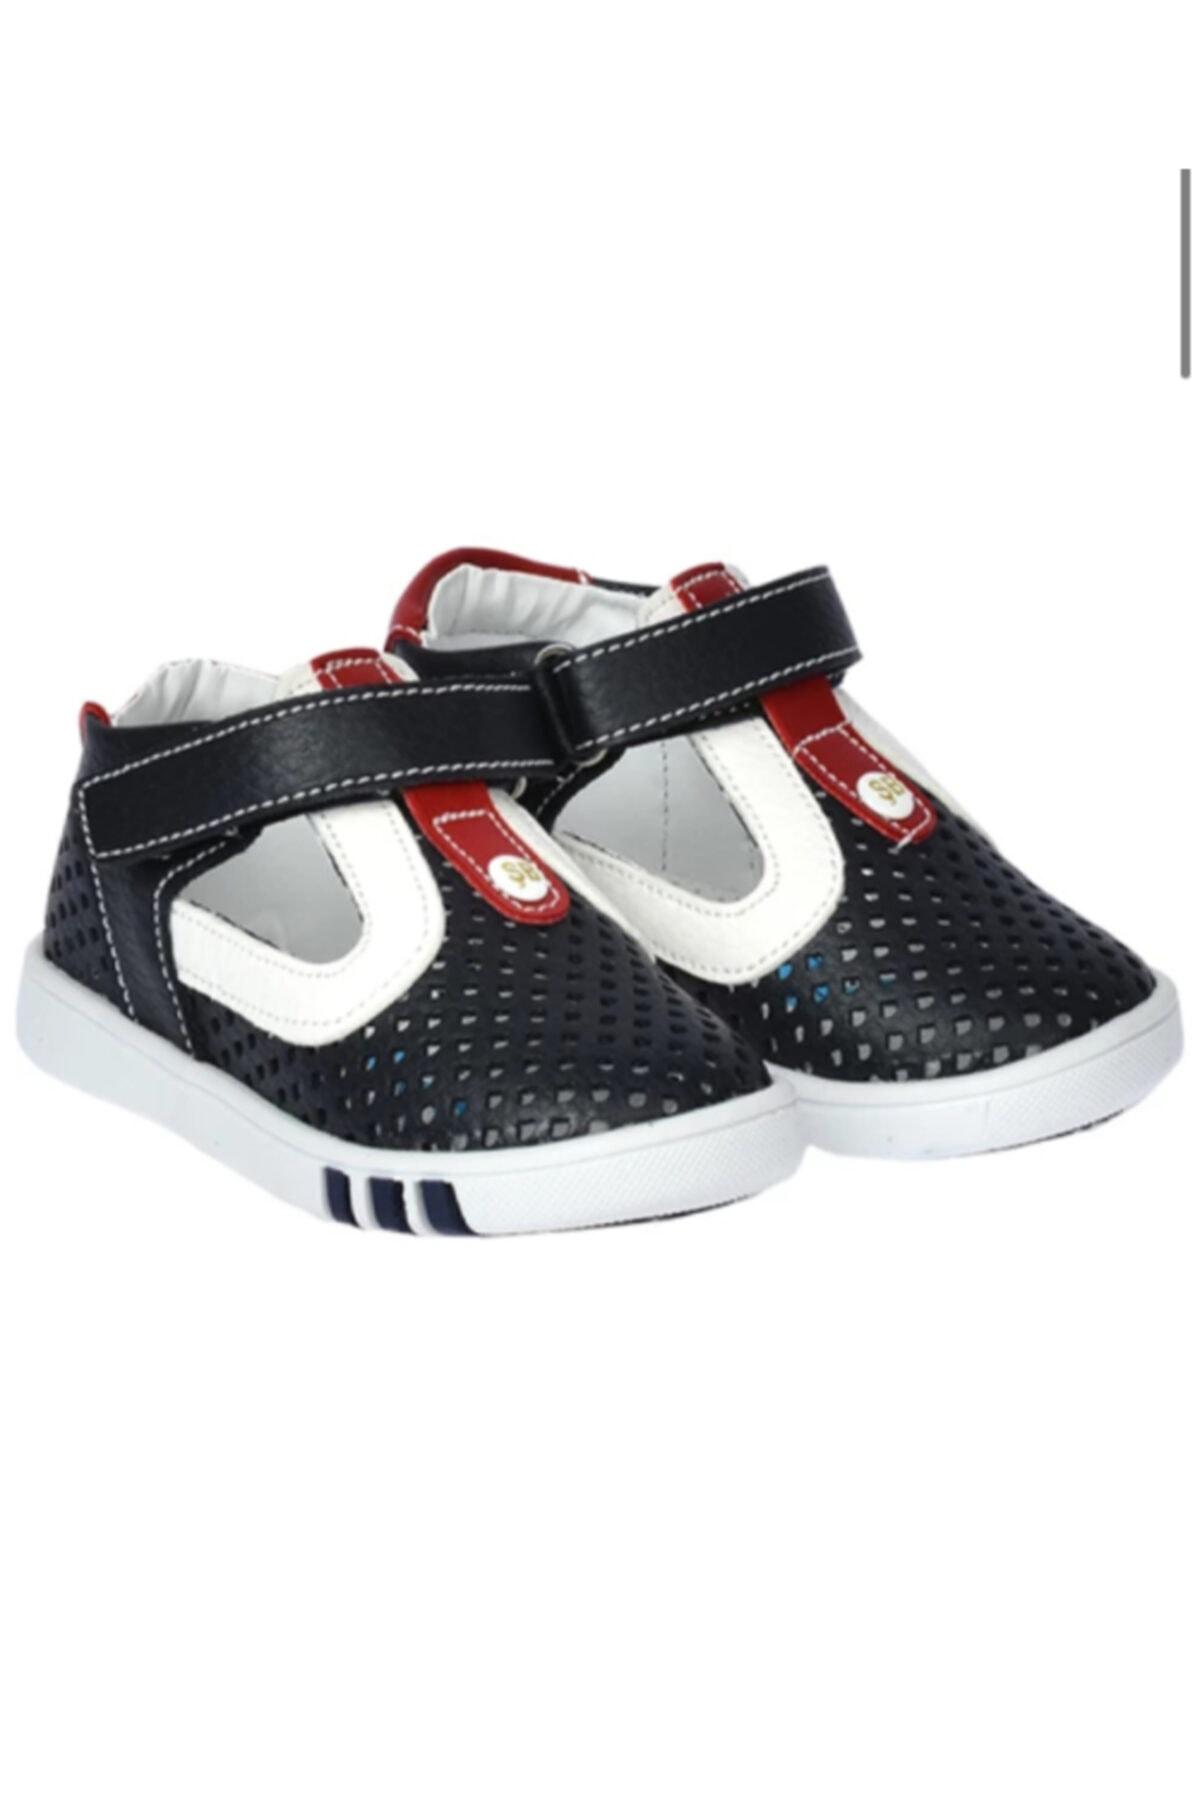 خرید نقدی کفش تخت نوزاد پسرانه ترک  برند Şirin Bebe رنگ لاجوردی کد ty93368860